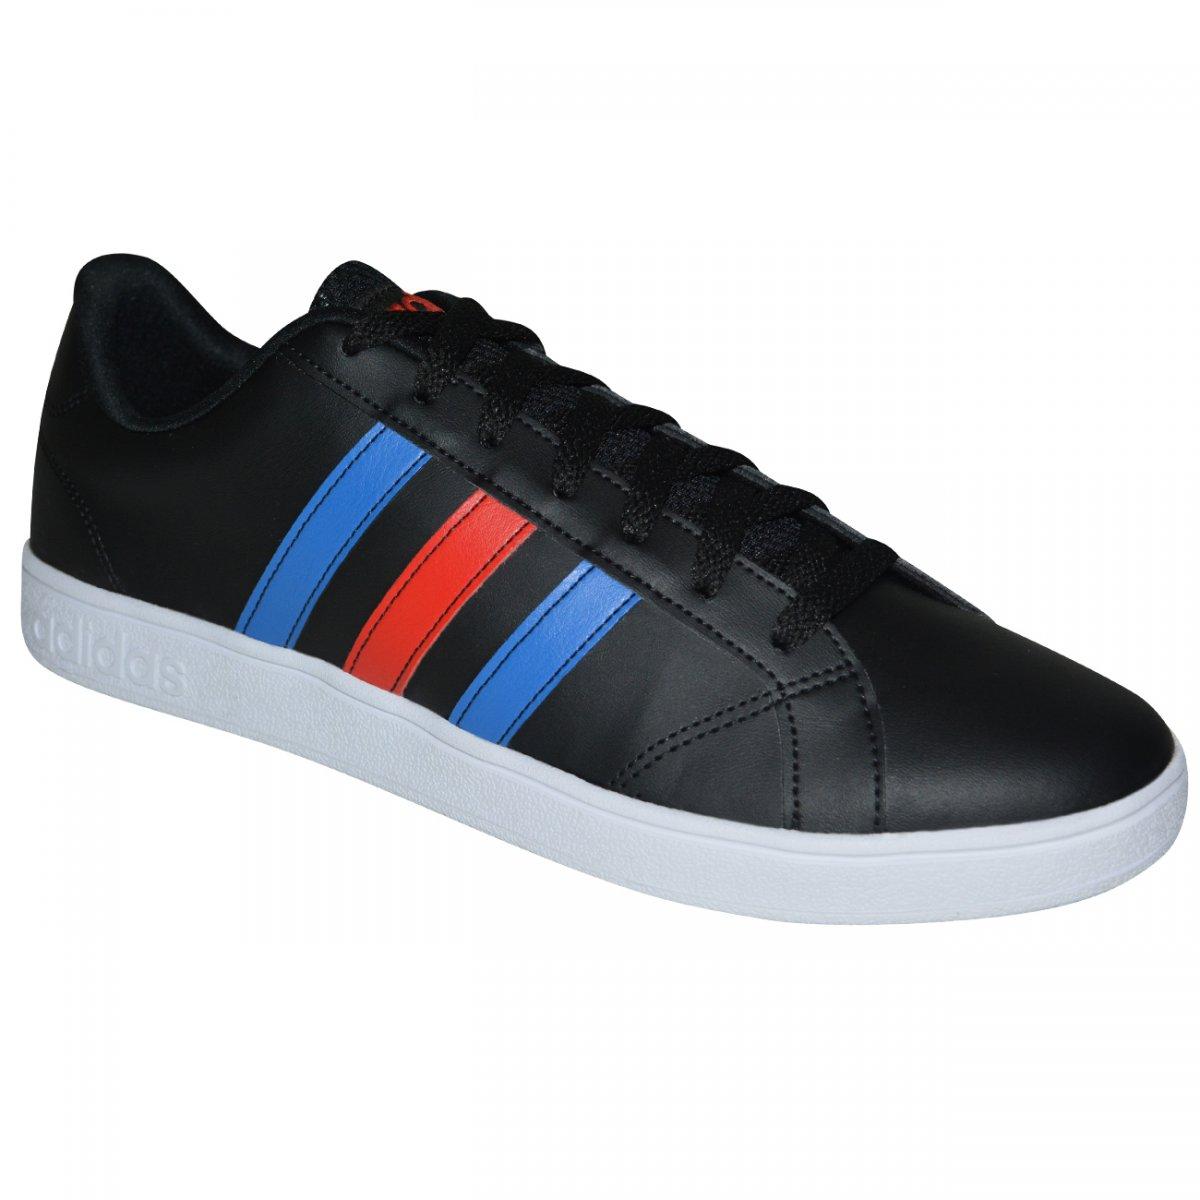 ceb5641643a Tenis Adidas VS Advantage DB0438 - Preto azul vermelho - Chuteira Nike